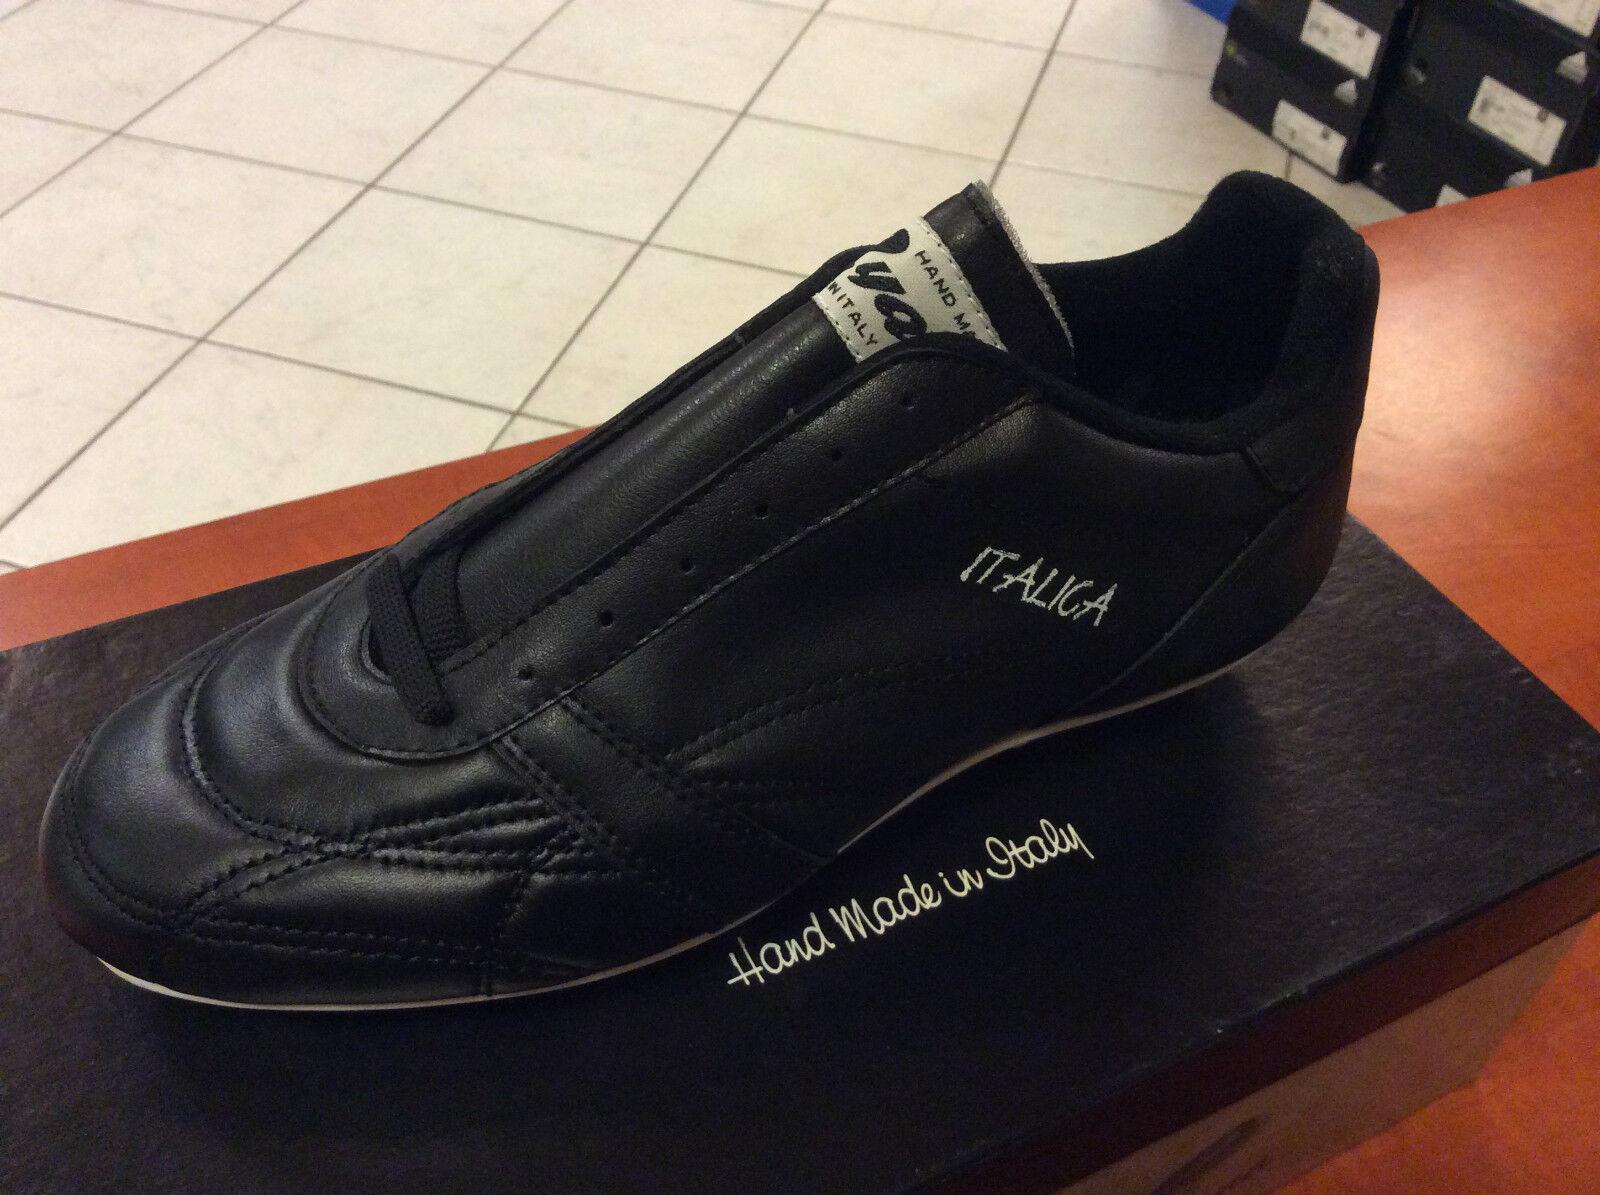 Herren Schuhe Fußball RYAL Italica - Fiore 13 Stollen Leder volle Fiore - d2add0